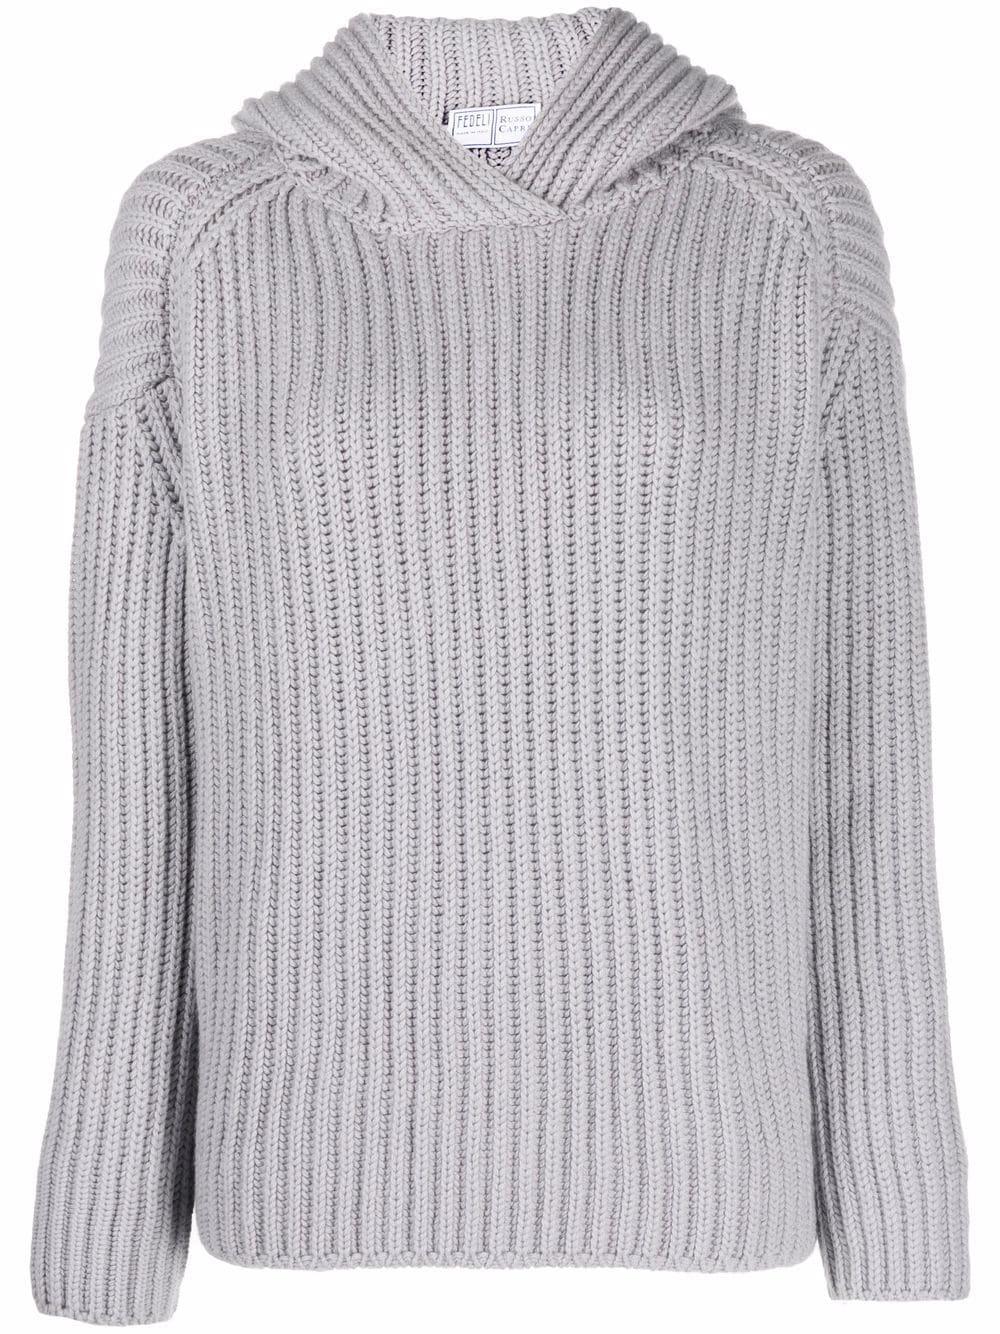 Fedeli rib knit hooded jumper - Grau